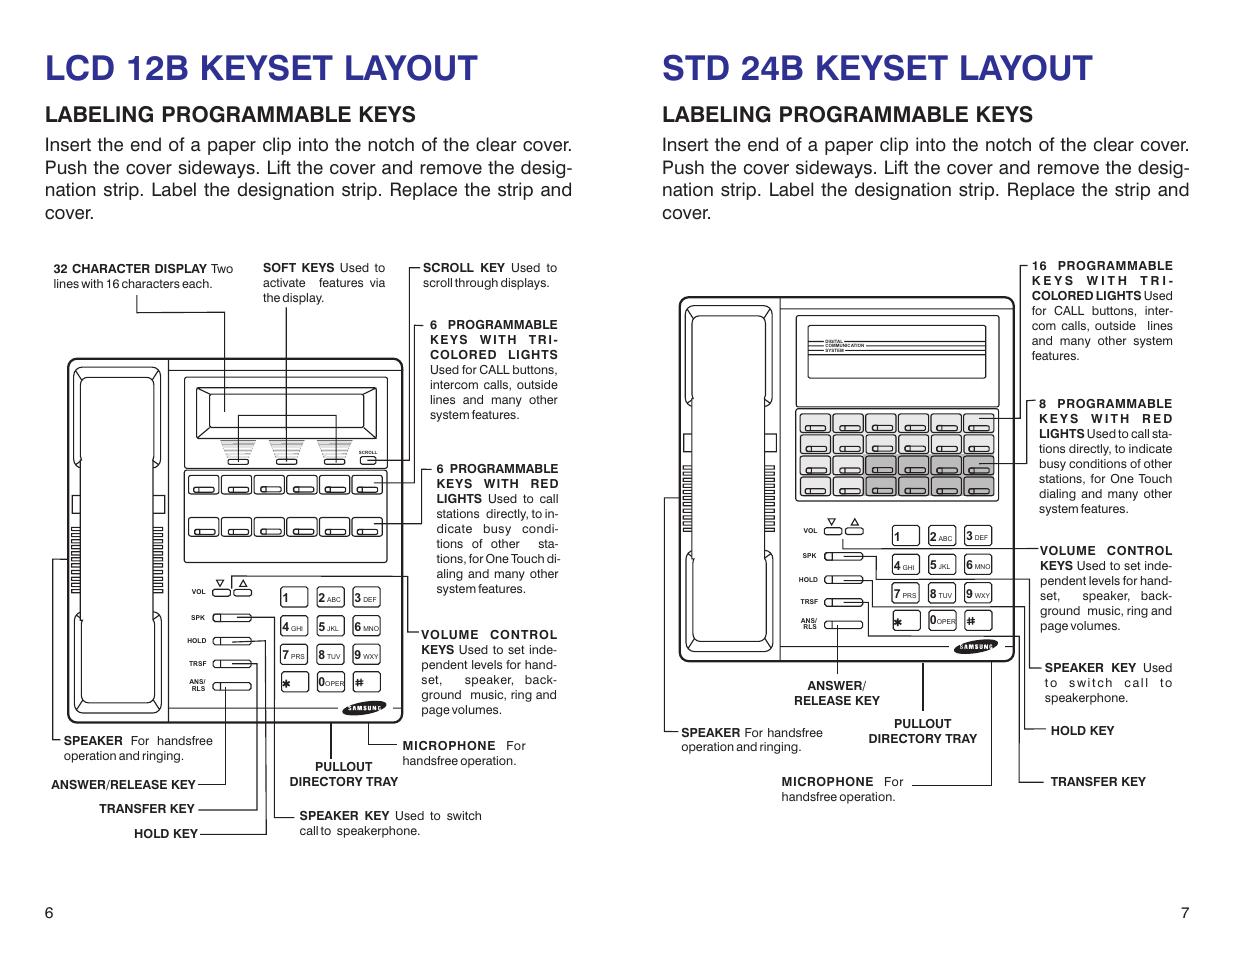 Std 24b keyset layout, Lcd 12b keyset layout, Labeling programmable keys    Samsung iDCS